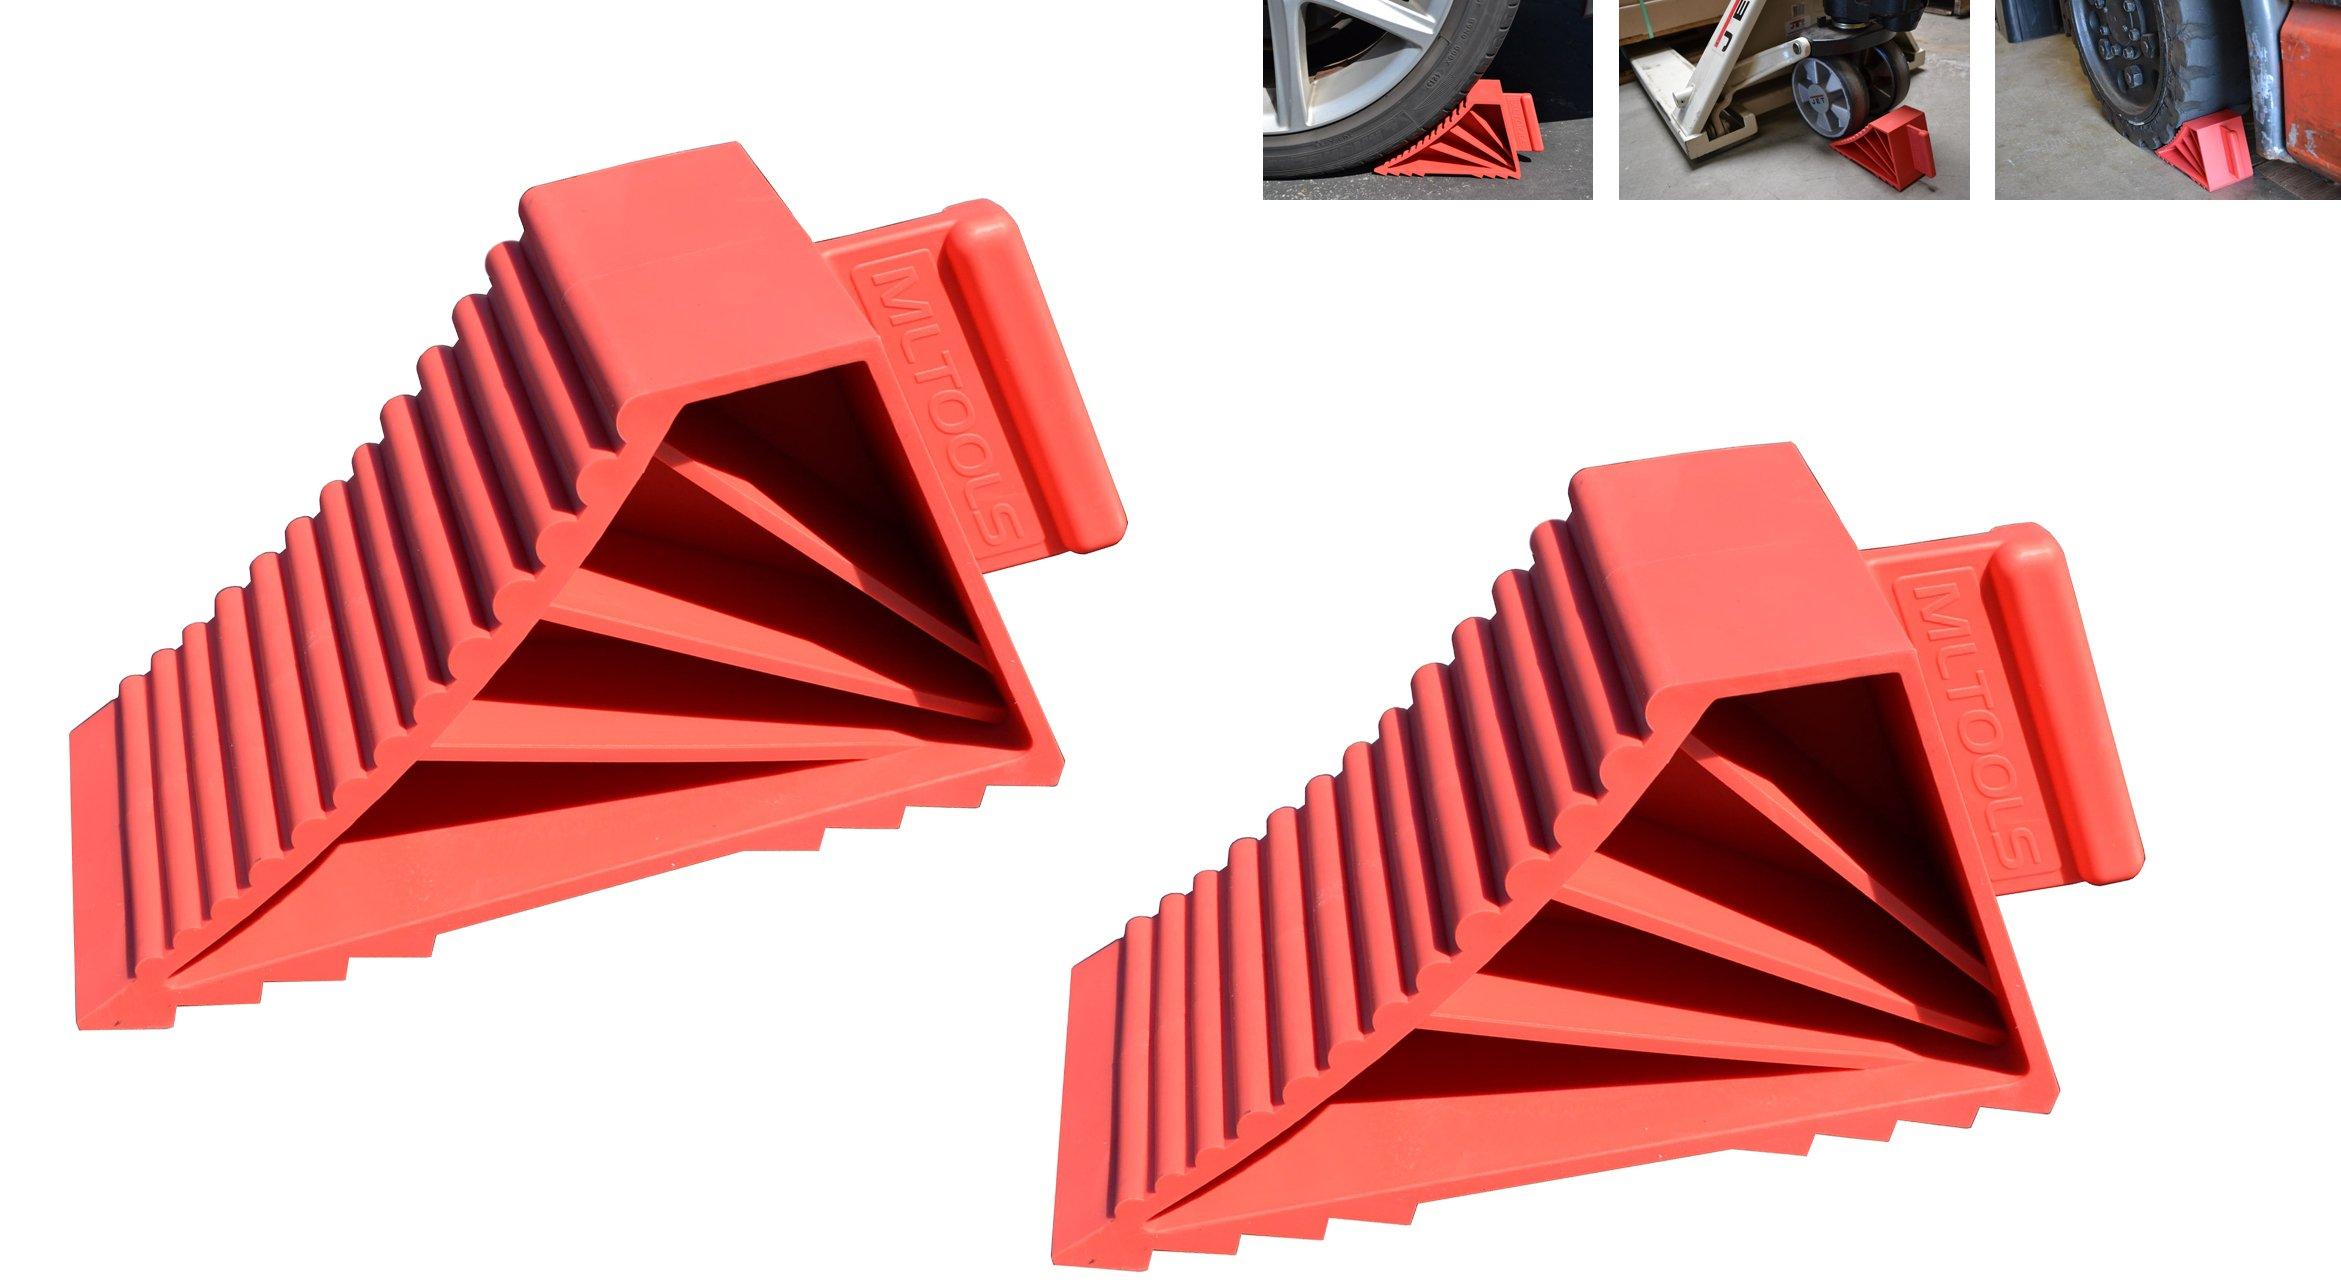 MLTOOLS Wheel Chocks | 2 pack High Grip Wheel Chocks | Made in USA WC283